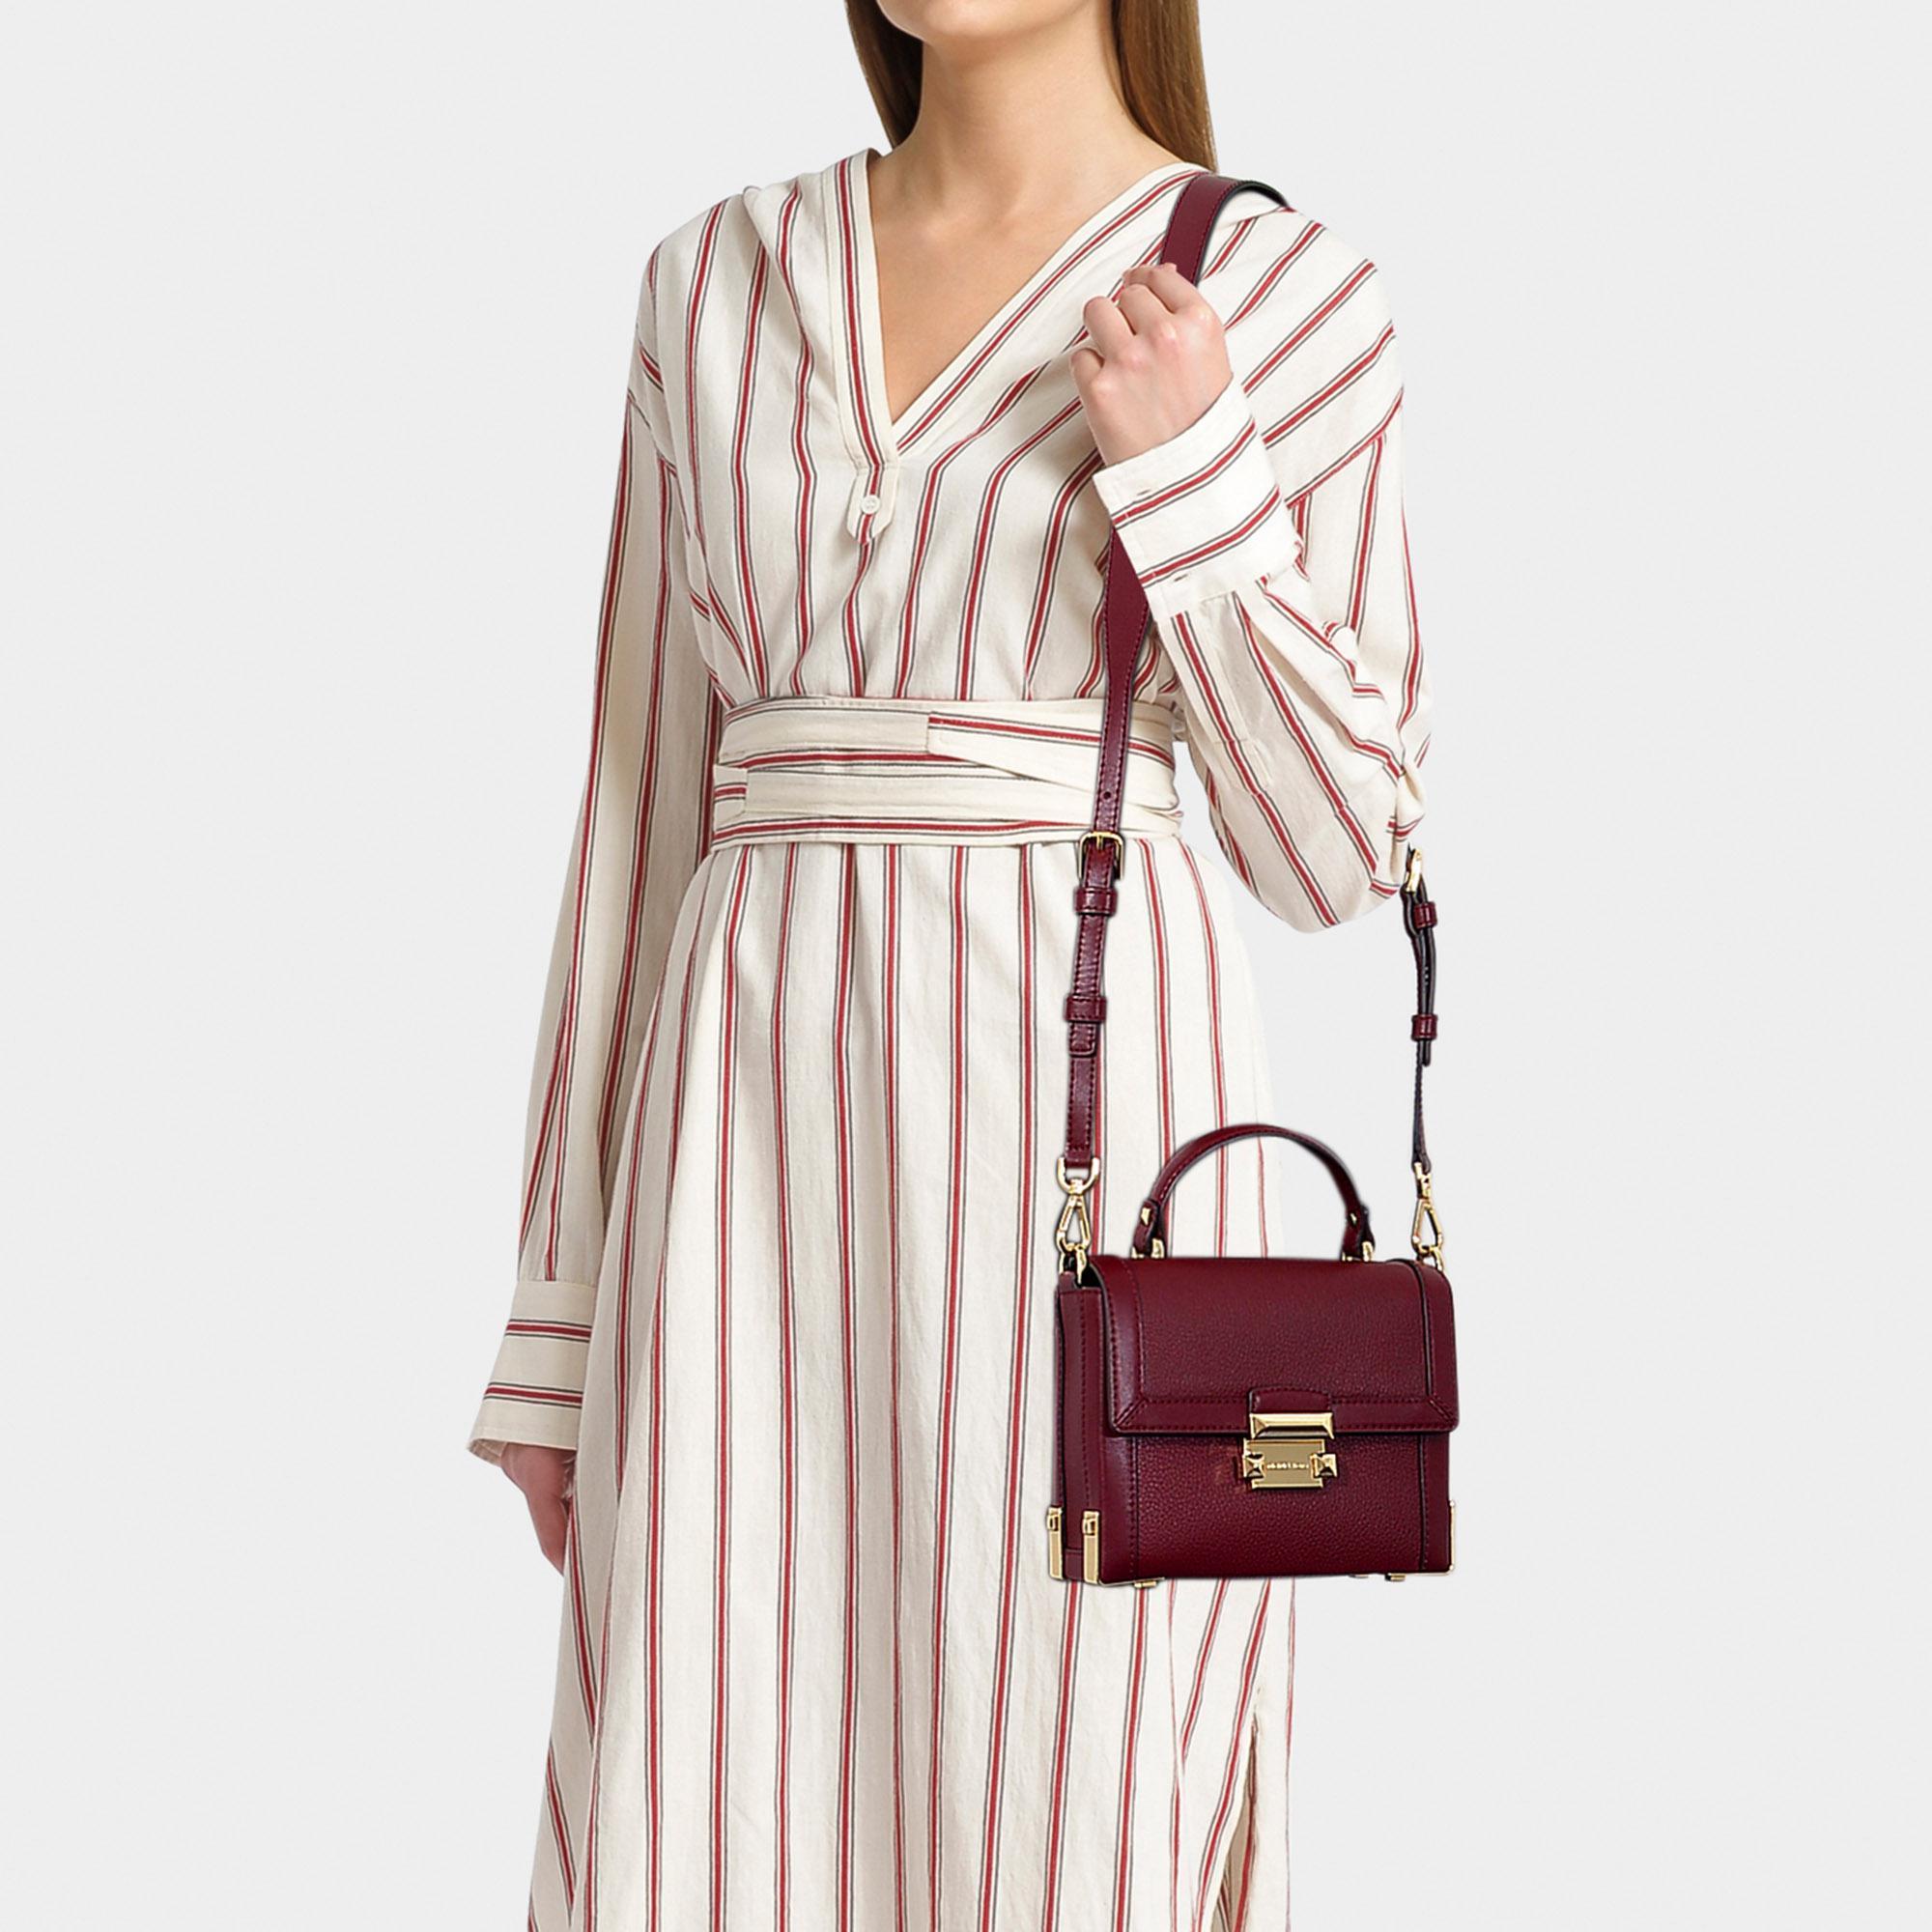 8da58157e65 MICHAEL Michael Kors Jayne Small Trunk Bag In Burgundy Calfskin - Lyst